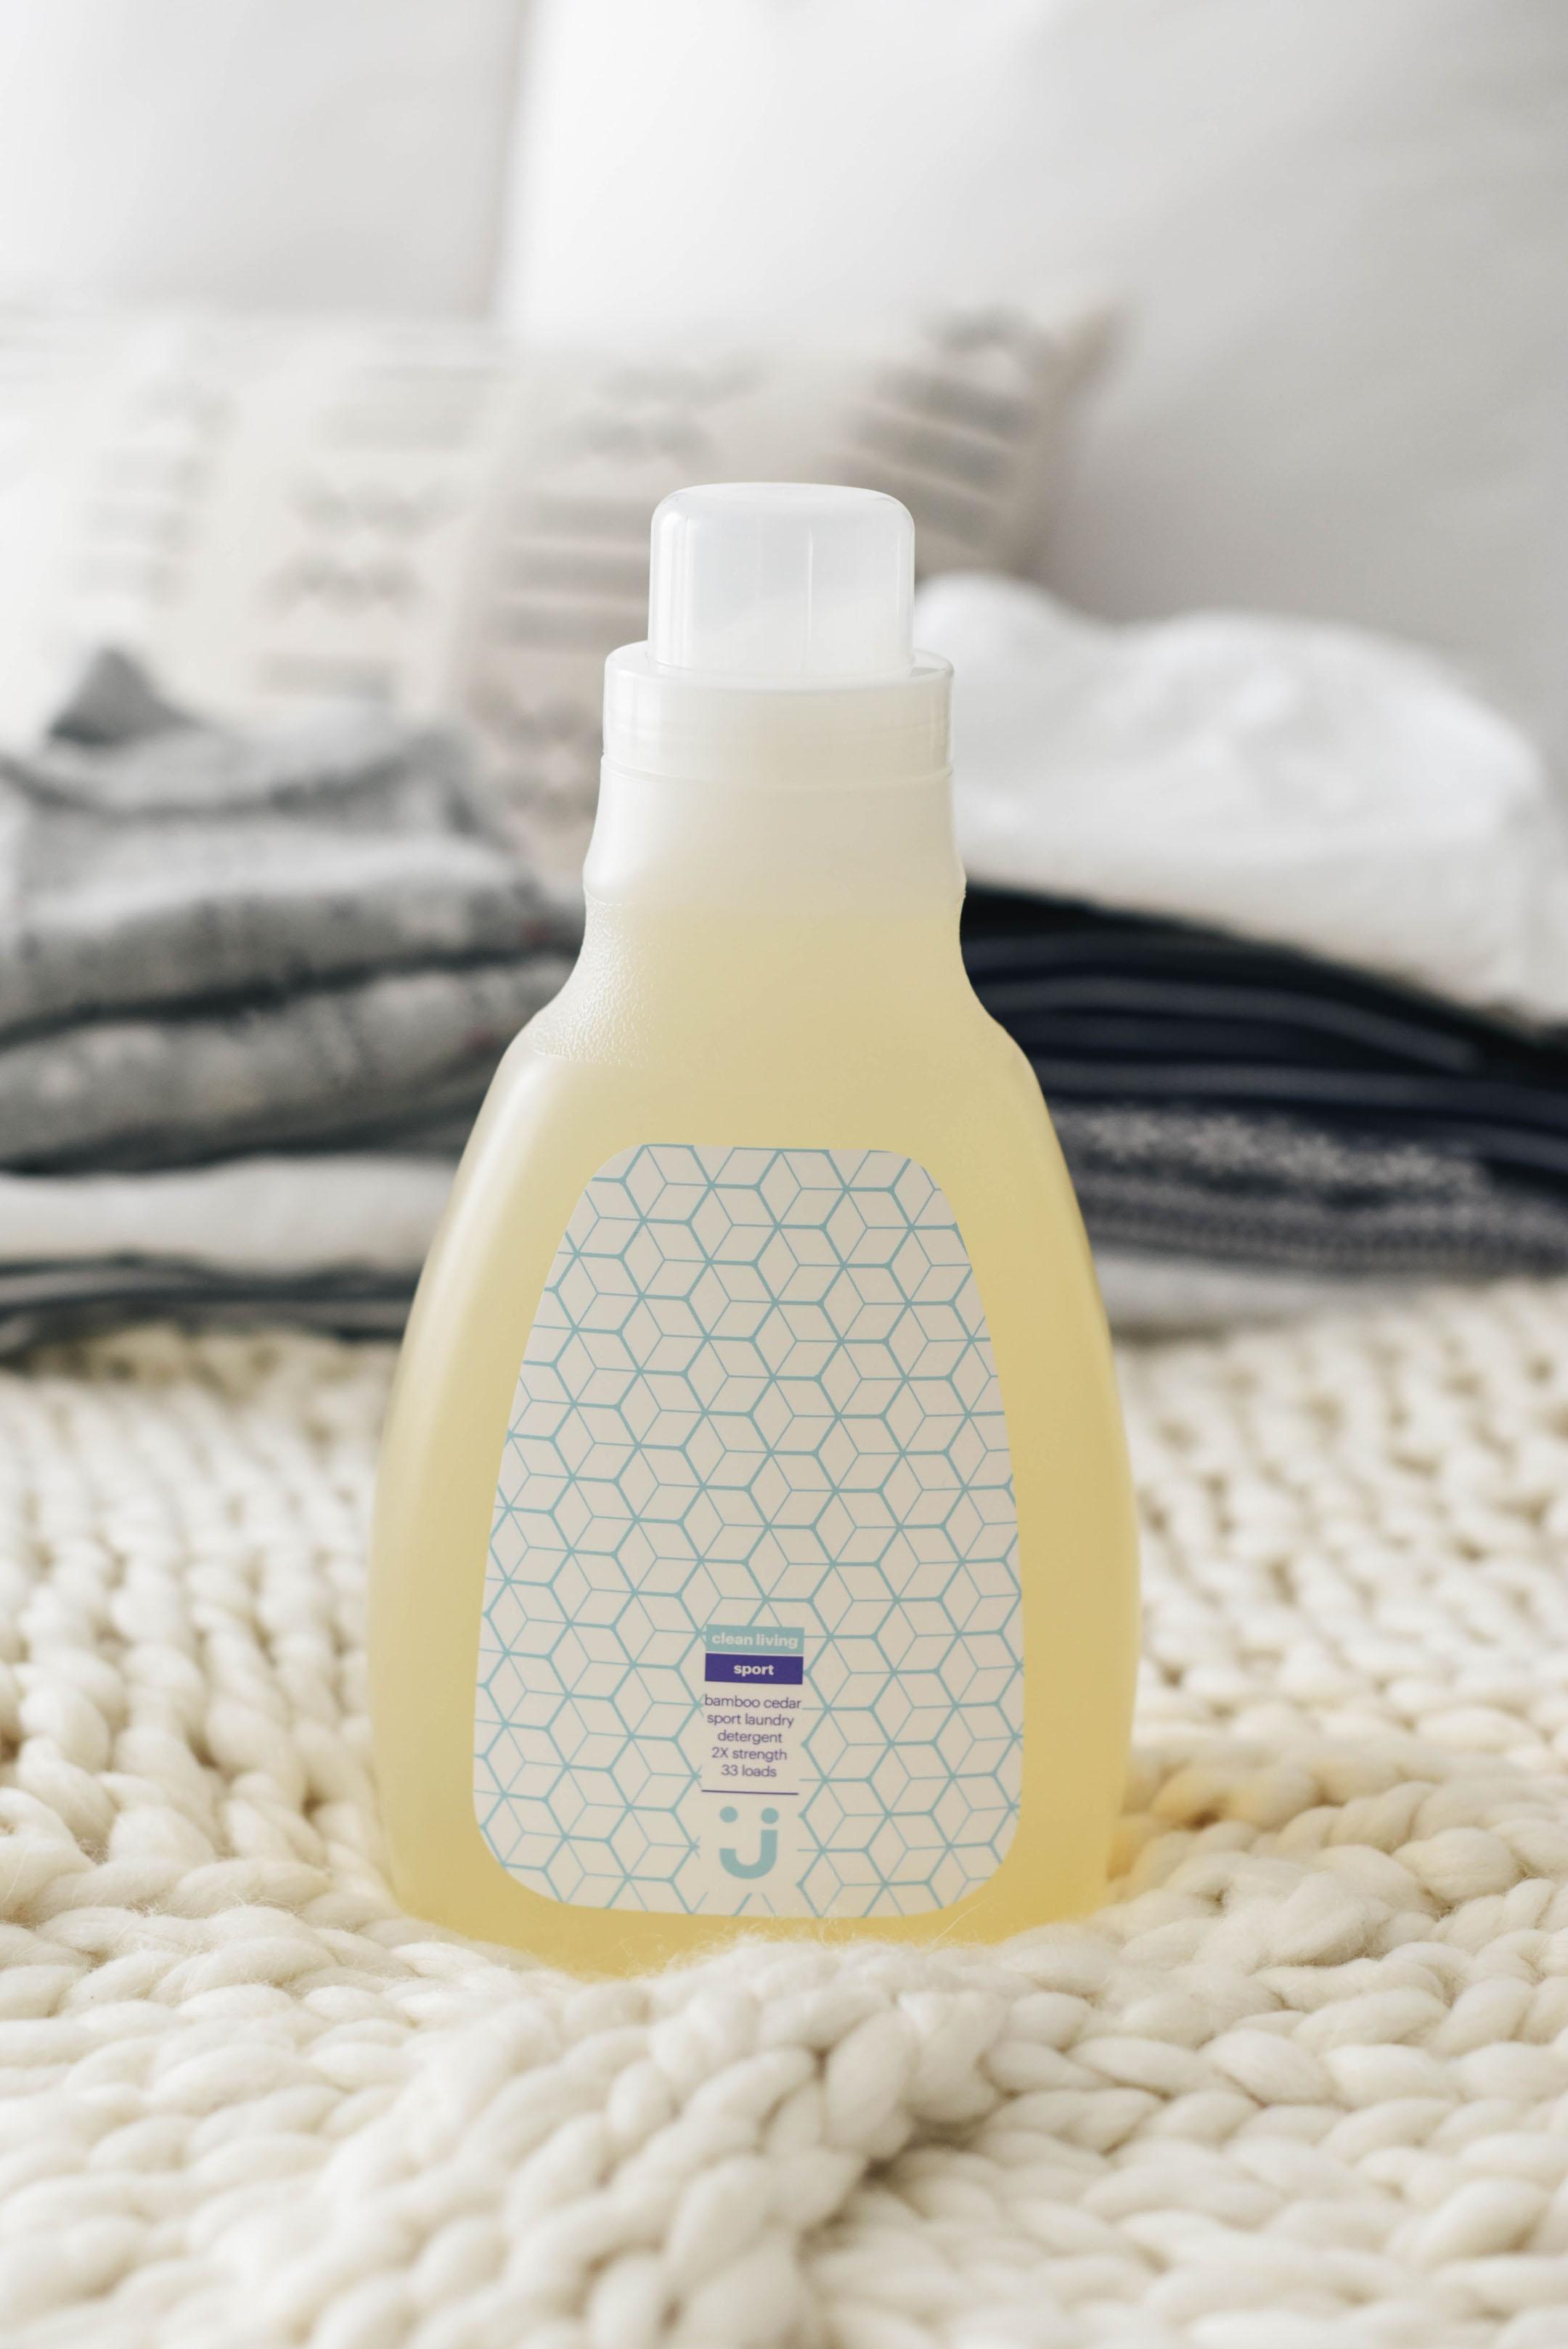 Uniquely J Bamboo Cedar natural laundry detergent